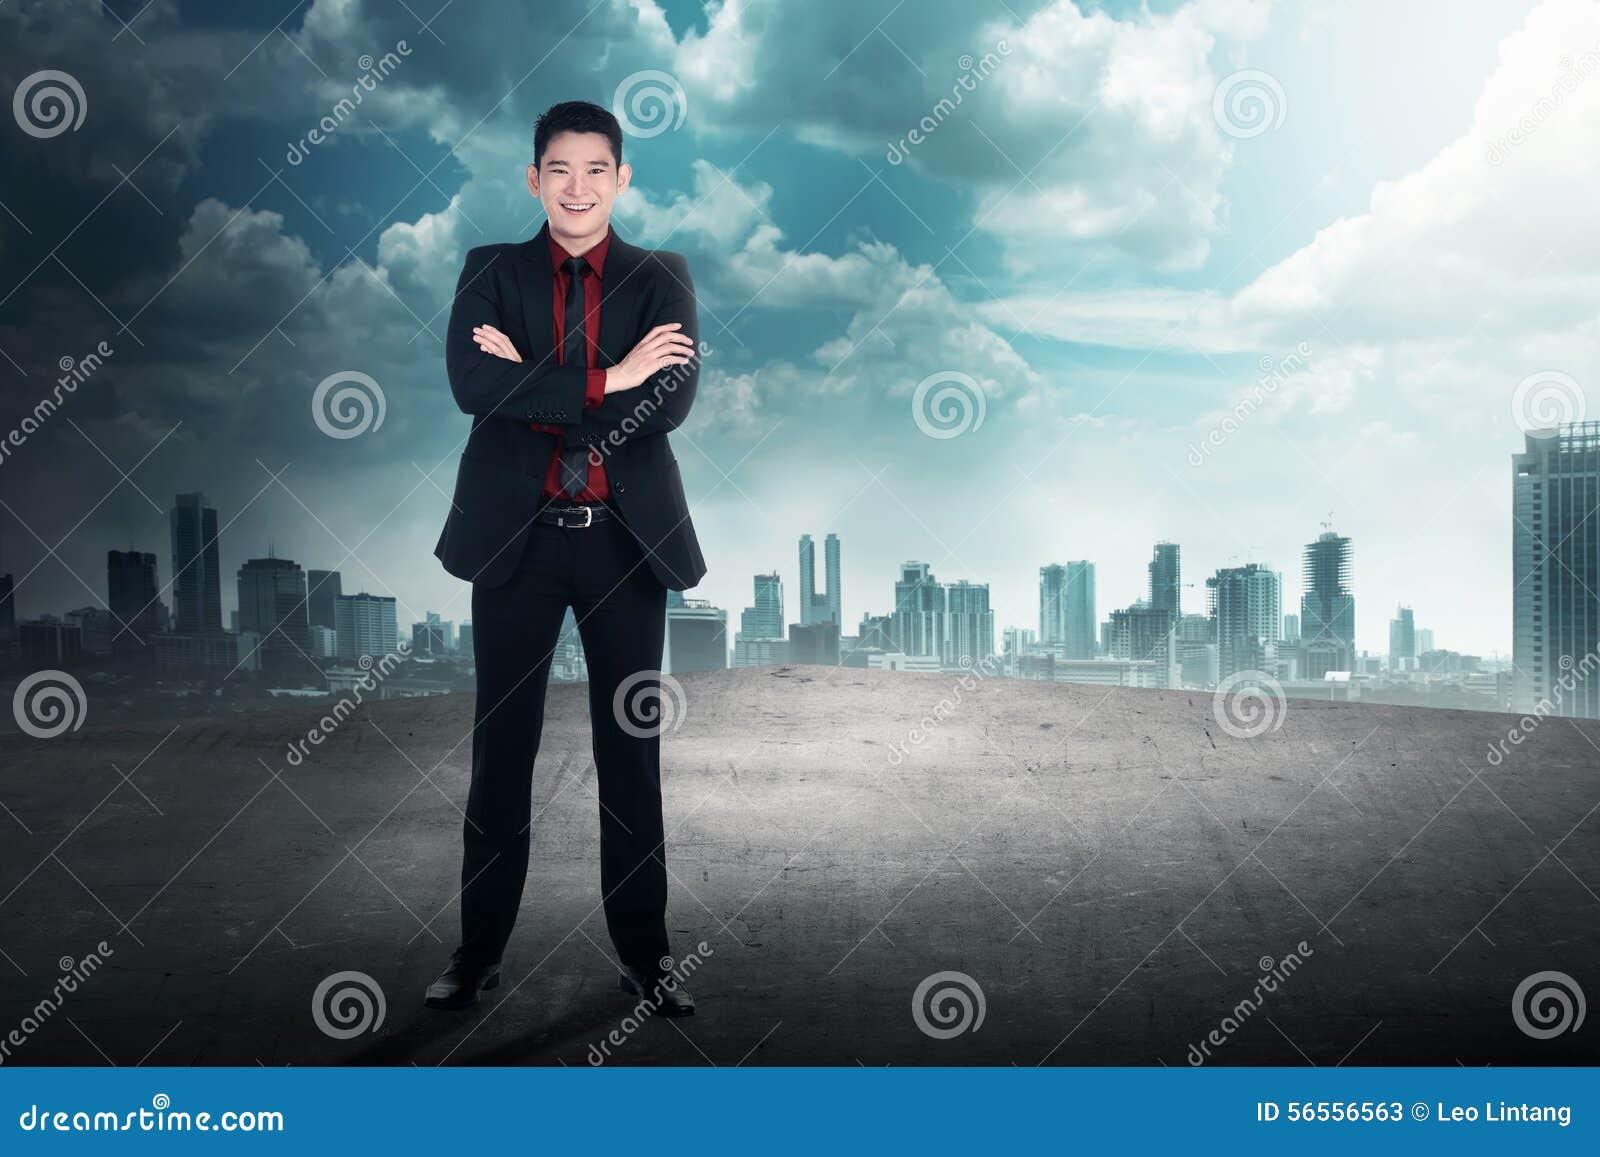 Download Πίσω άποψη του επιτυχούς επιχειρησιακού ατόμου στη στέγη Στοκ Εικόνα - εικόνα από σύννεφο, νέος: 56556563